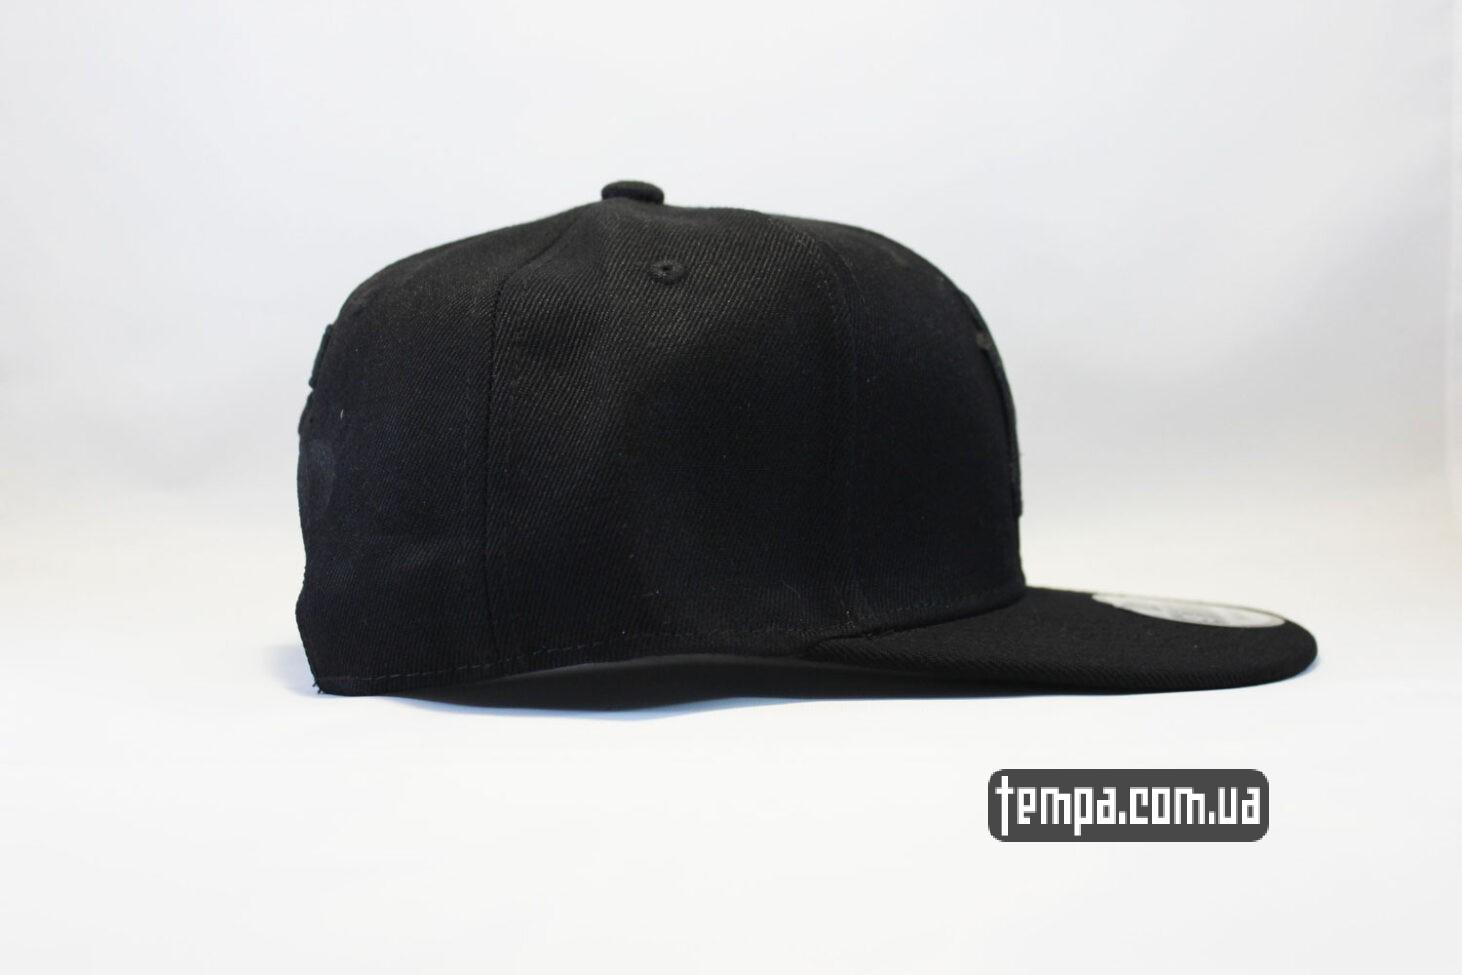 black on black бейсболка кепка Snapback New Era NYC New York черная на черном black